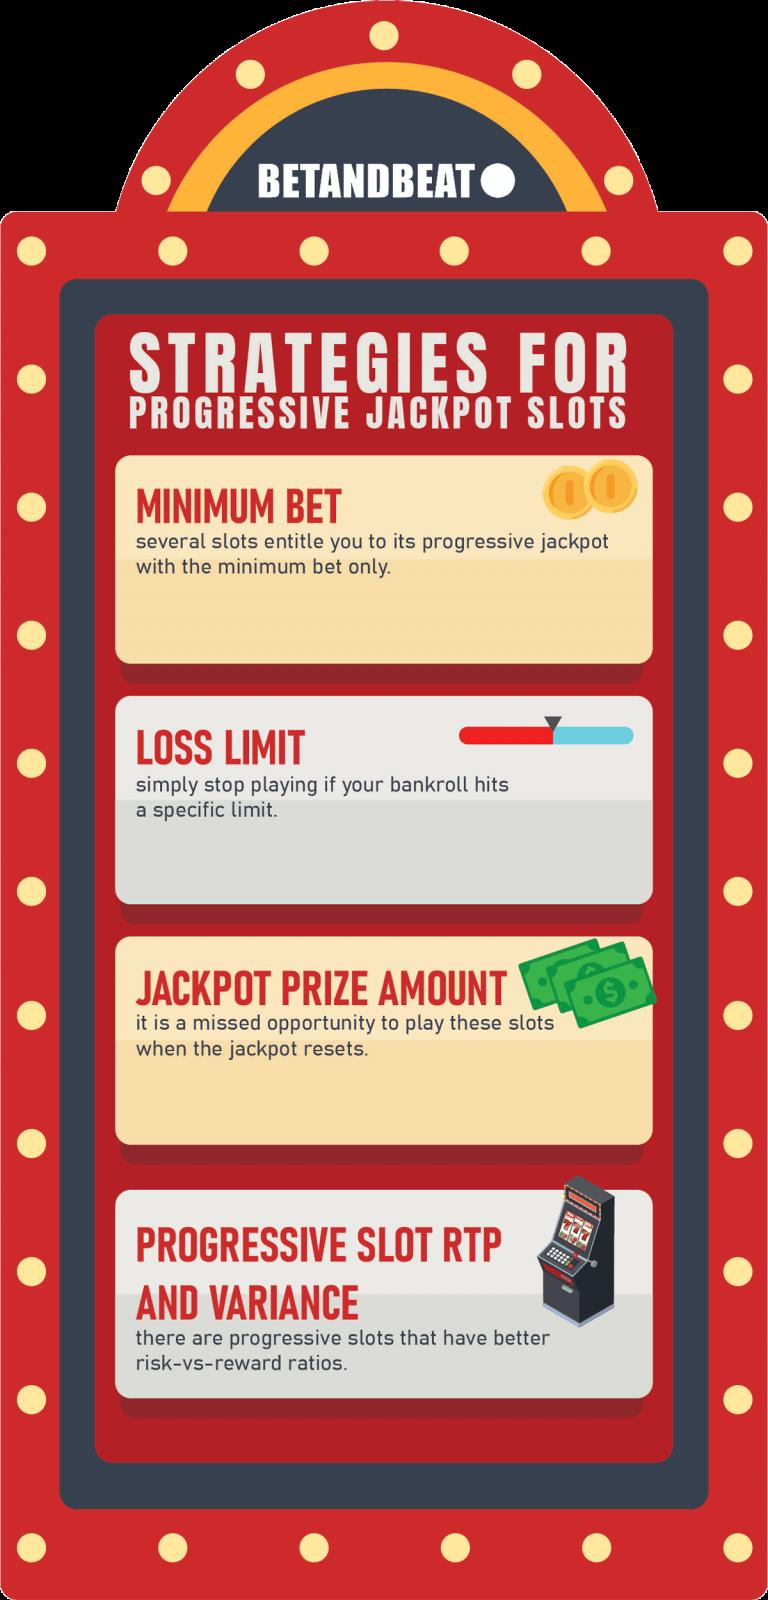 How To Win a Progressive Jackpot